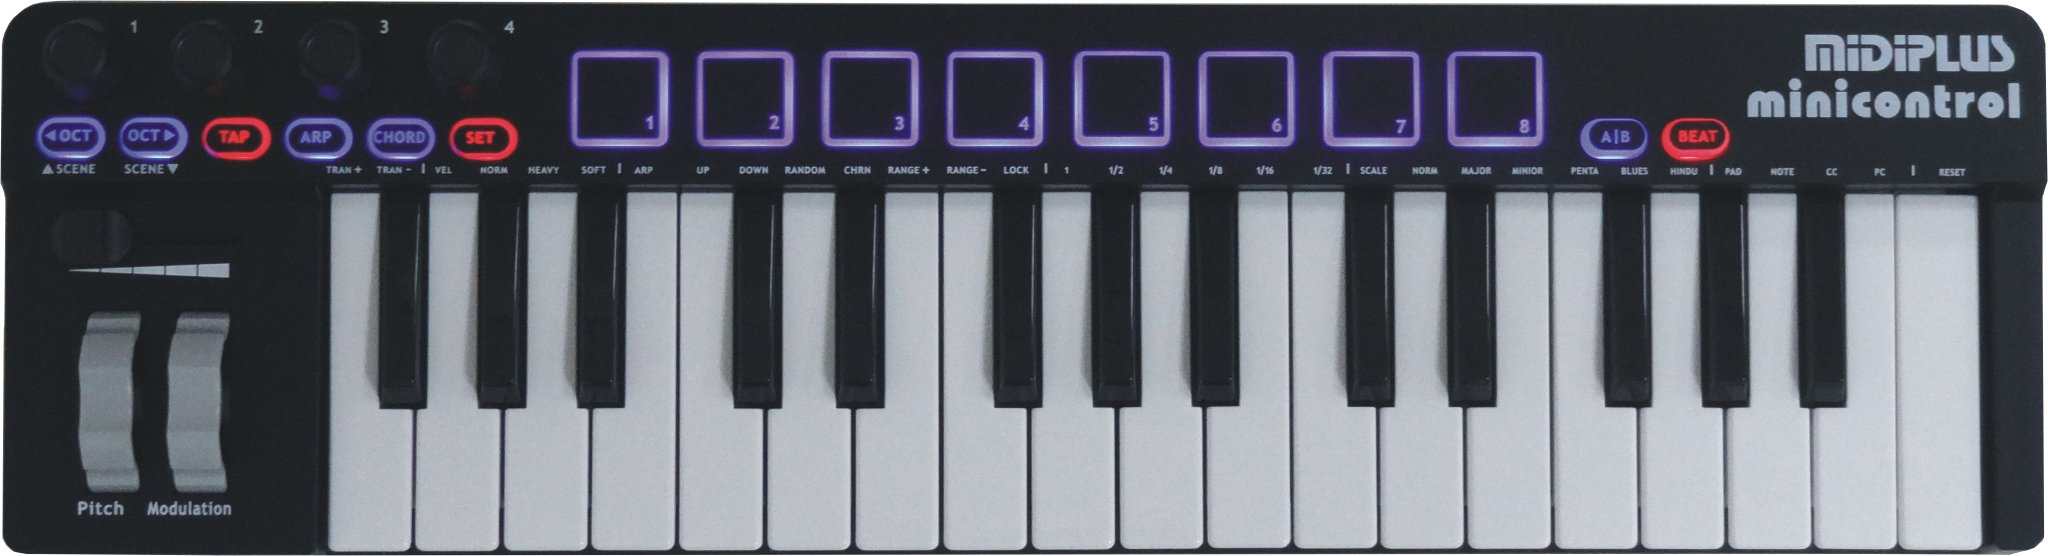 midiplus minicontrol USB MIDI keyboard controller by Midiplus